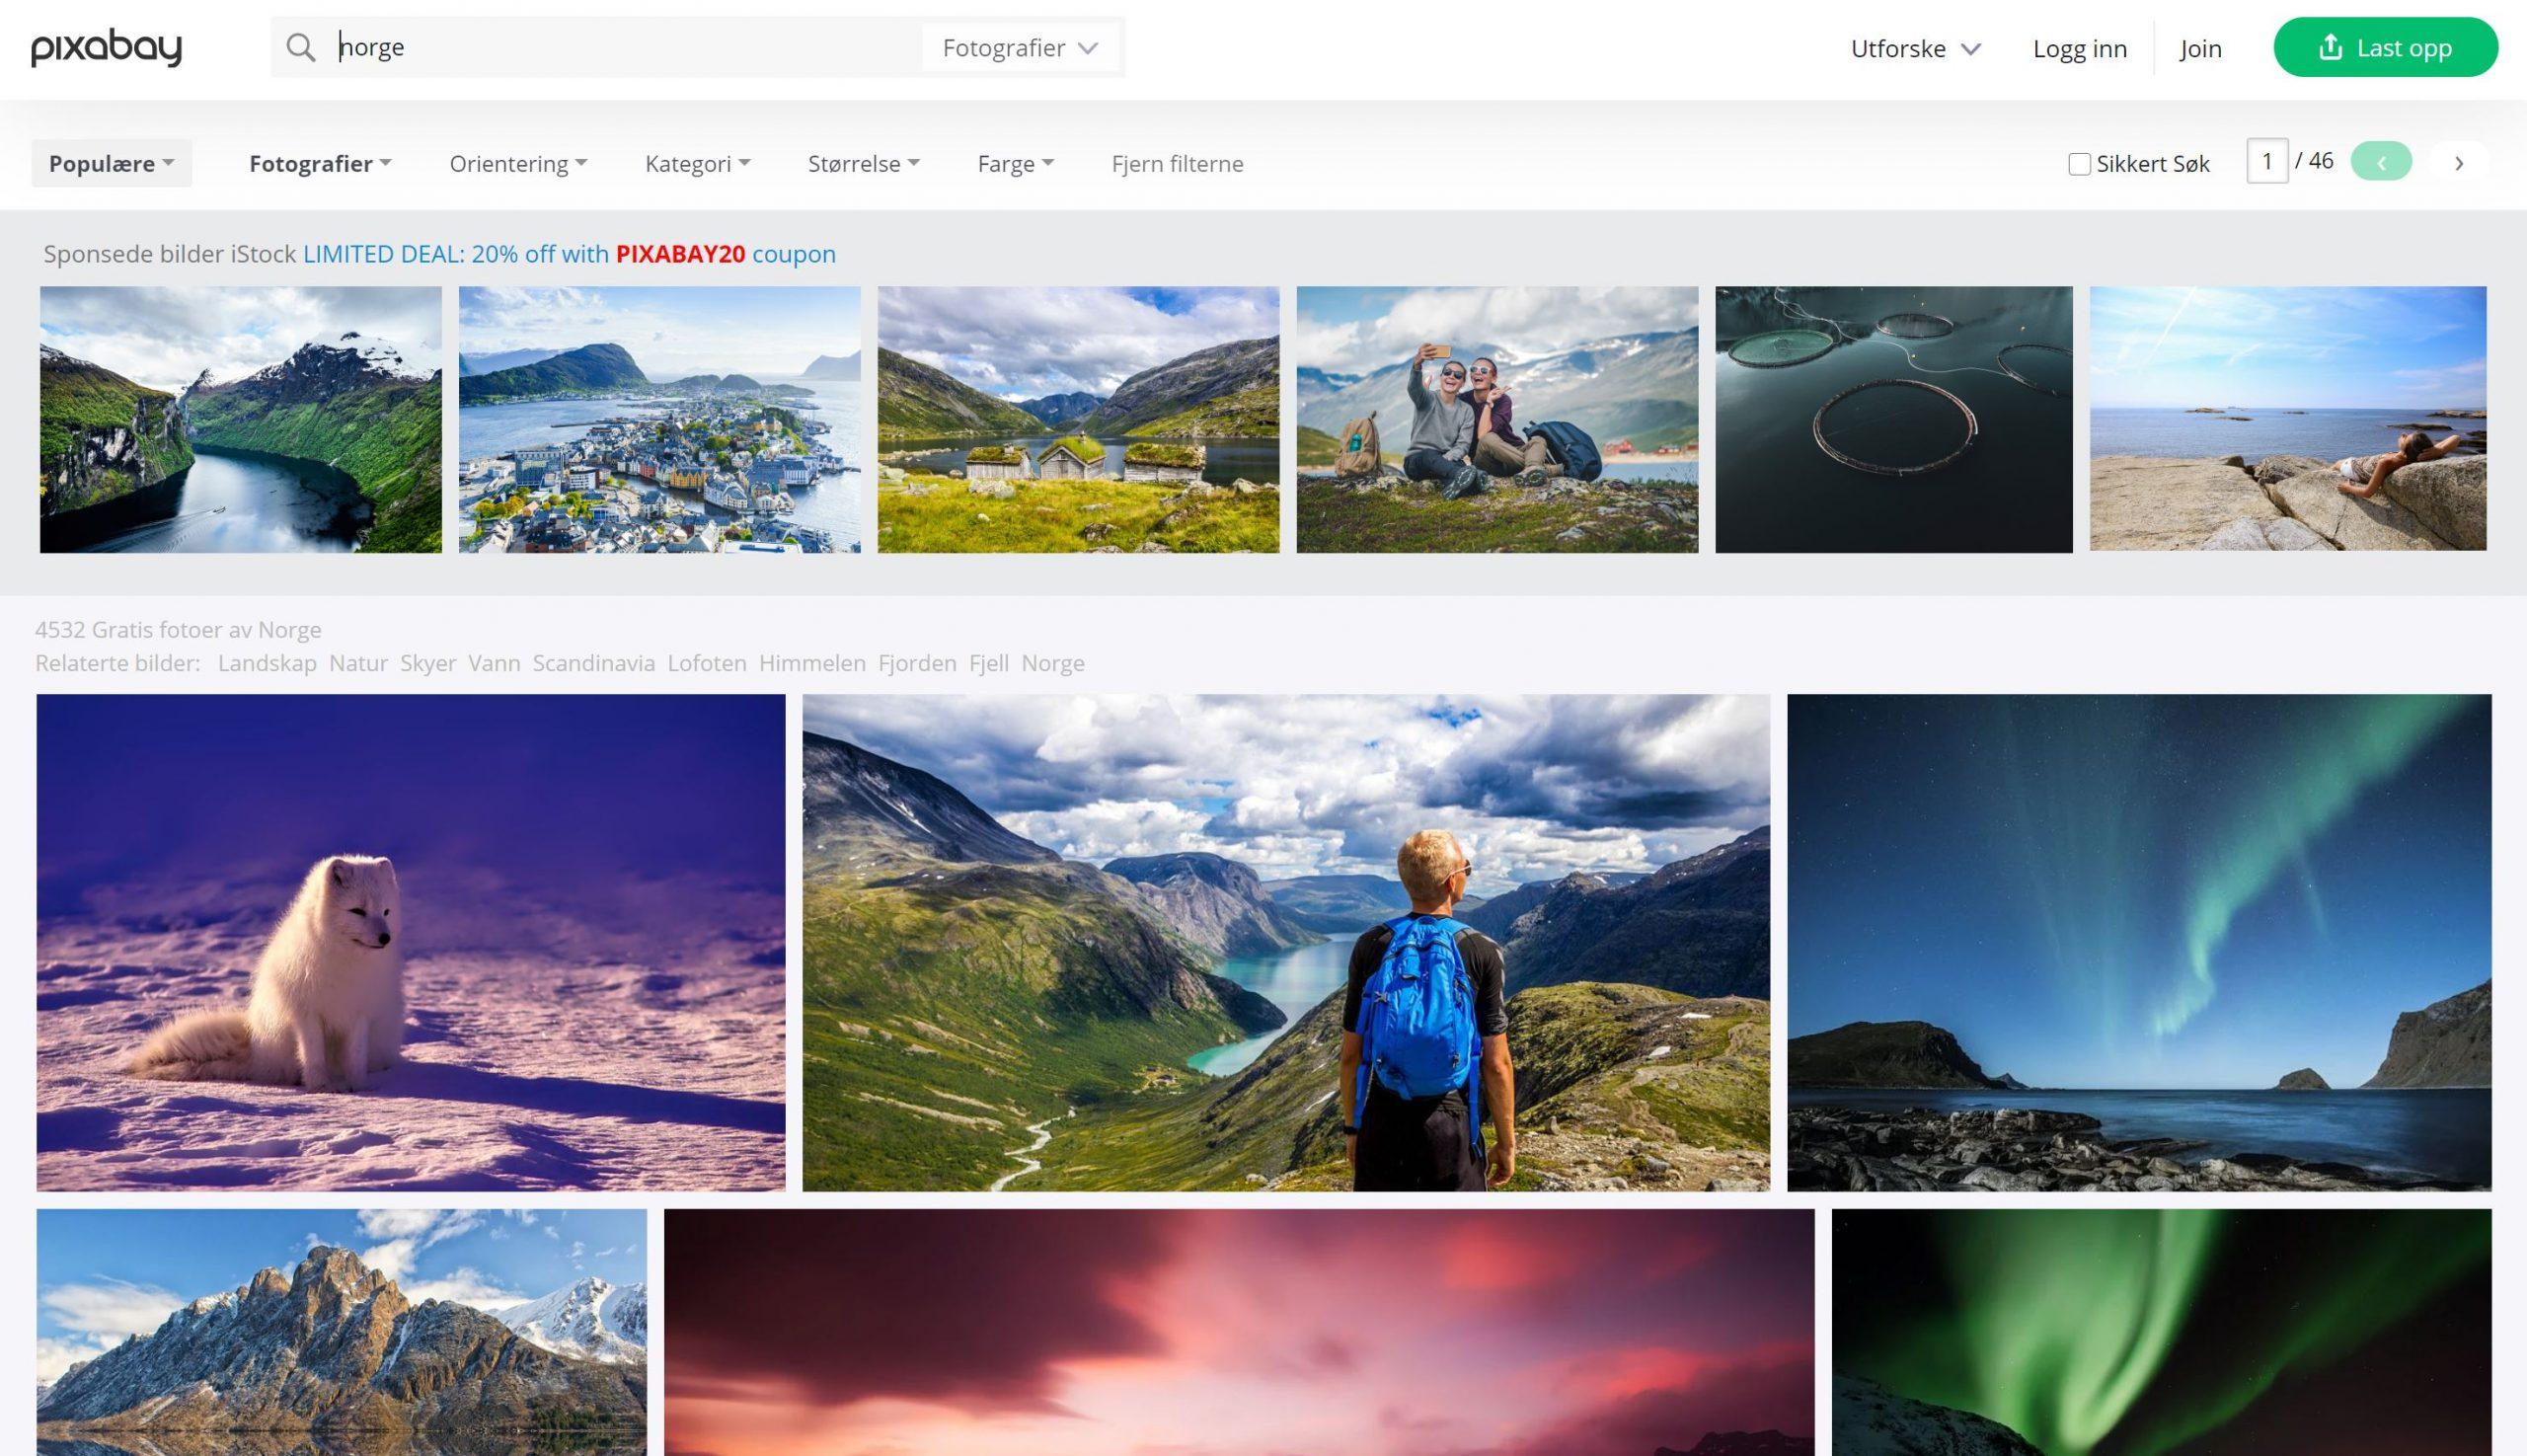 Pixabay forside med søk på bilder fra Norge